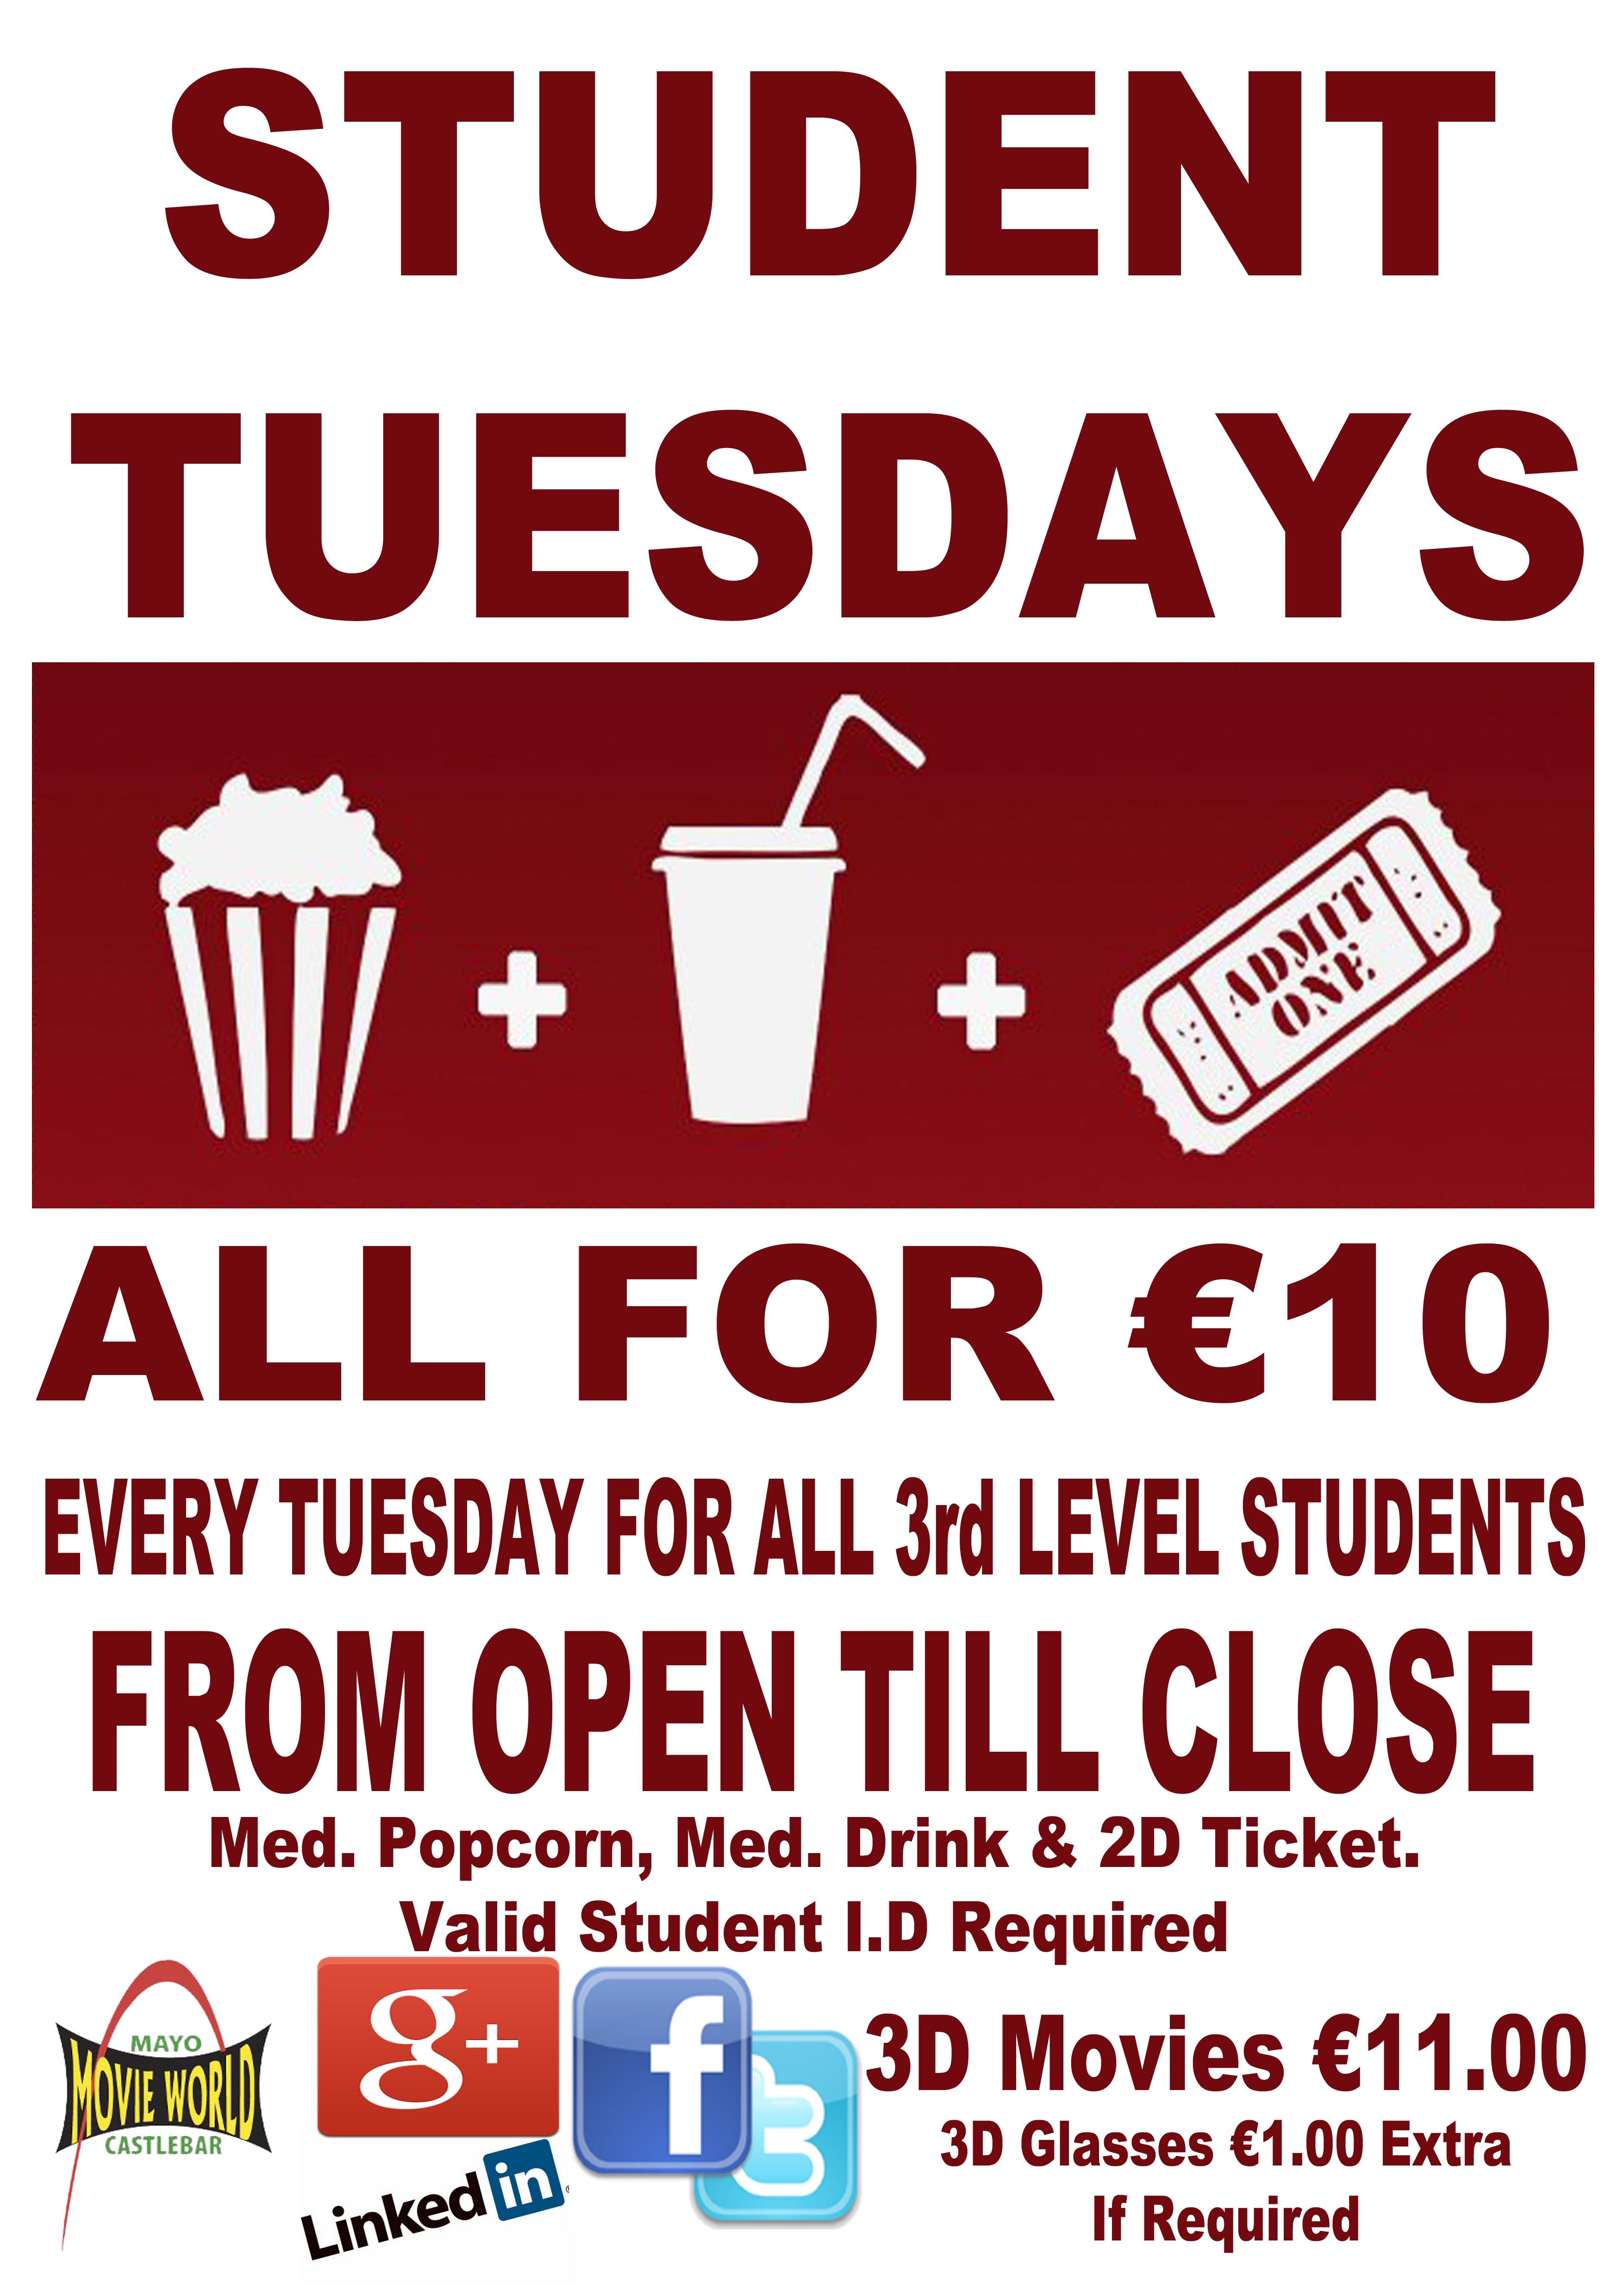 Student_Tuesday_9.jpg